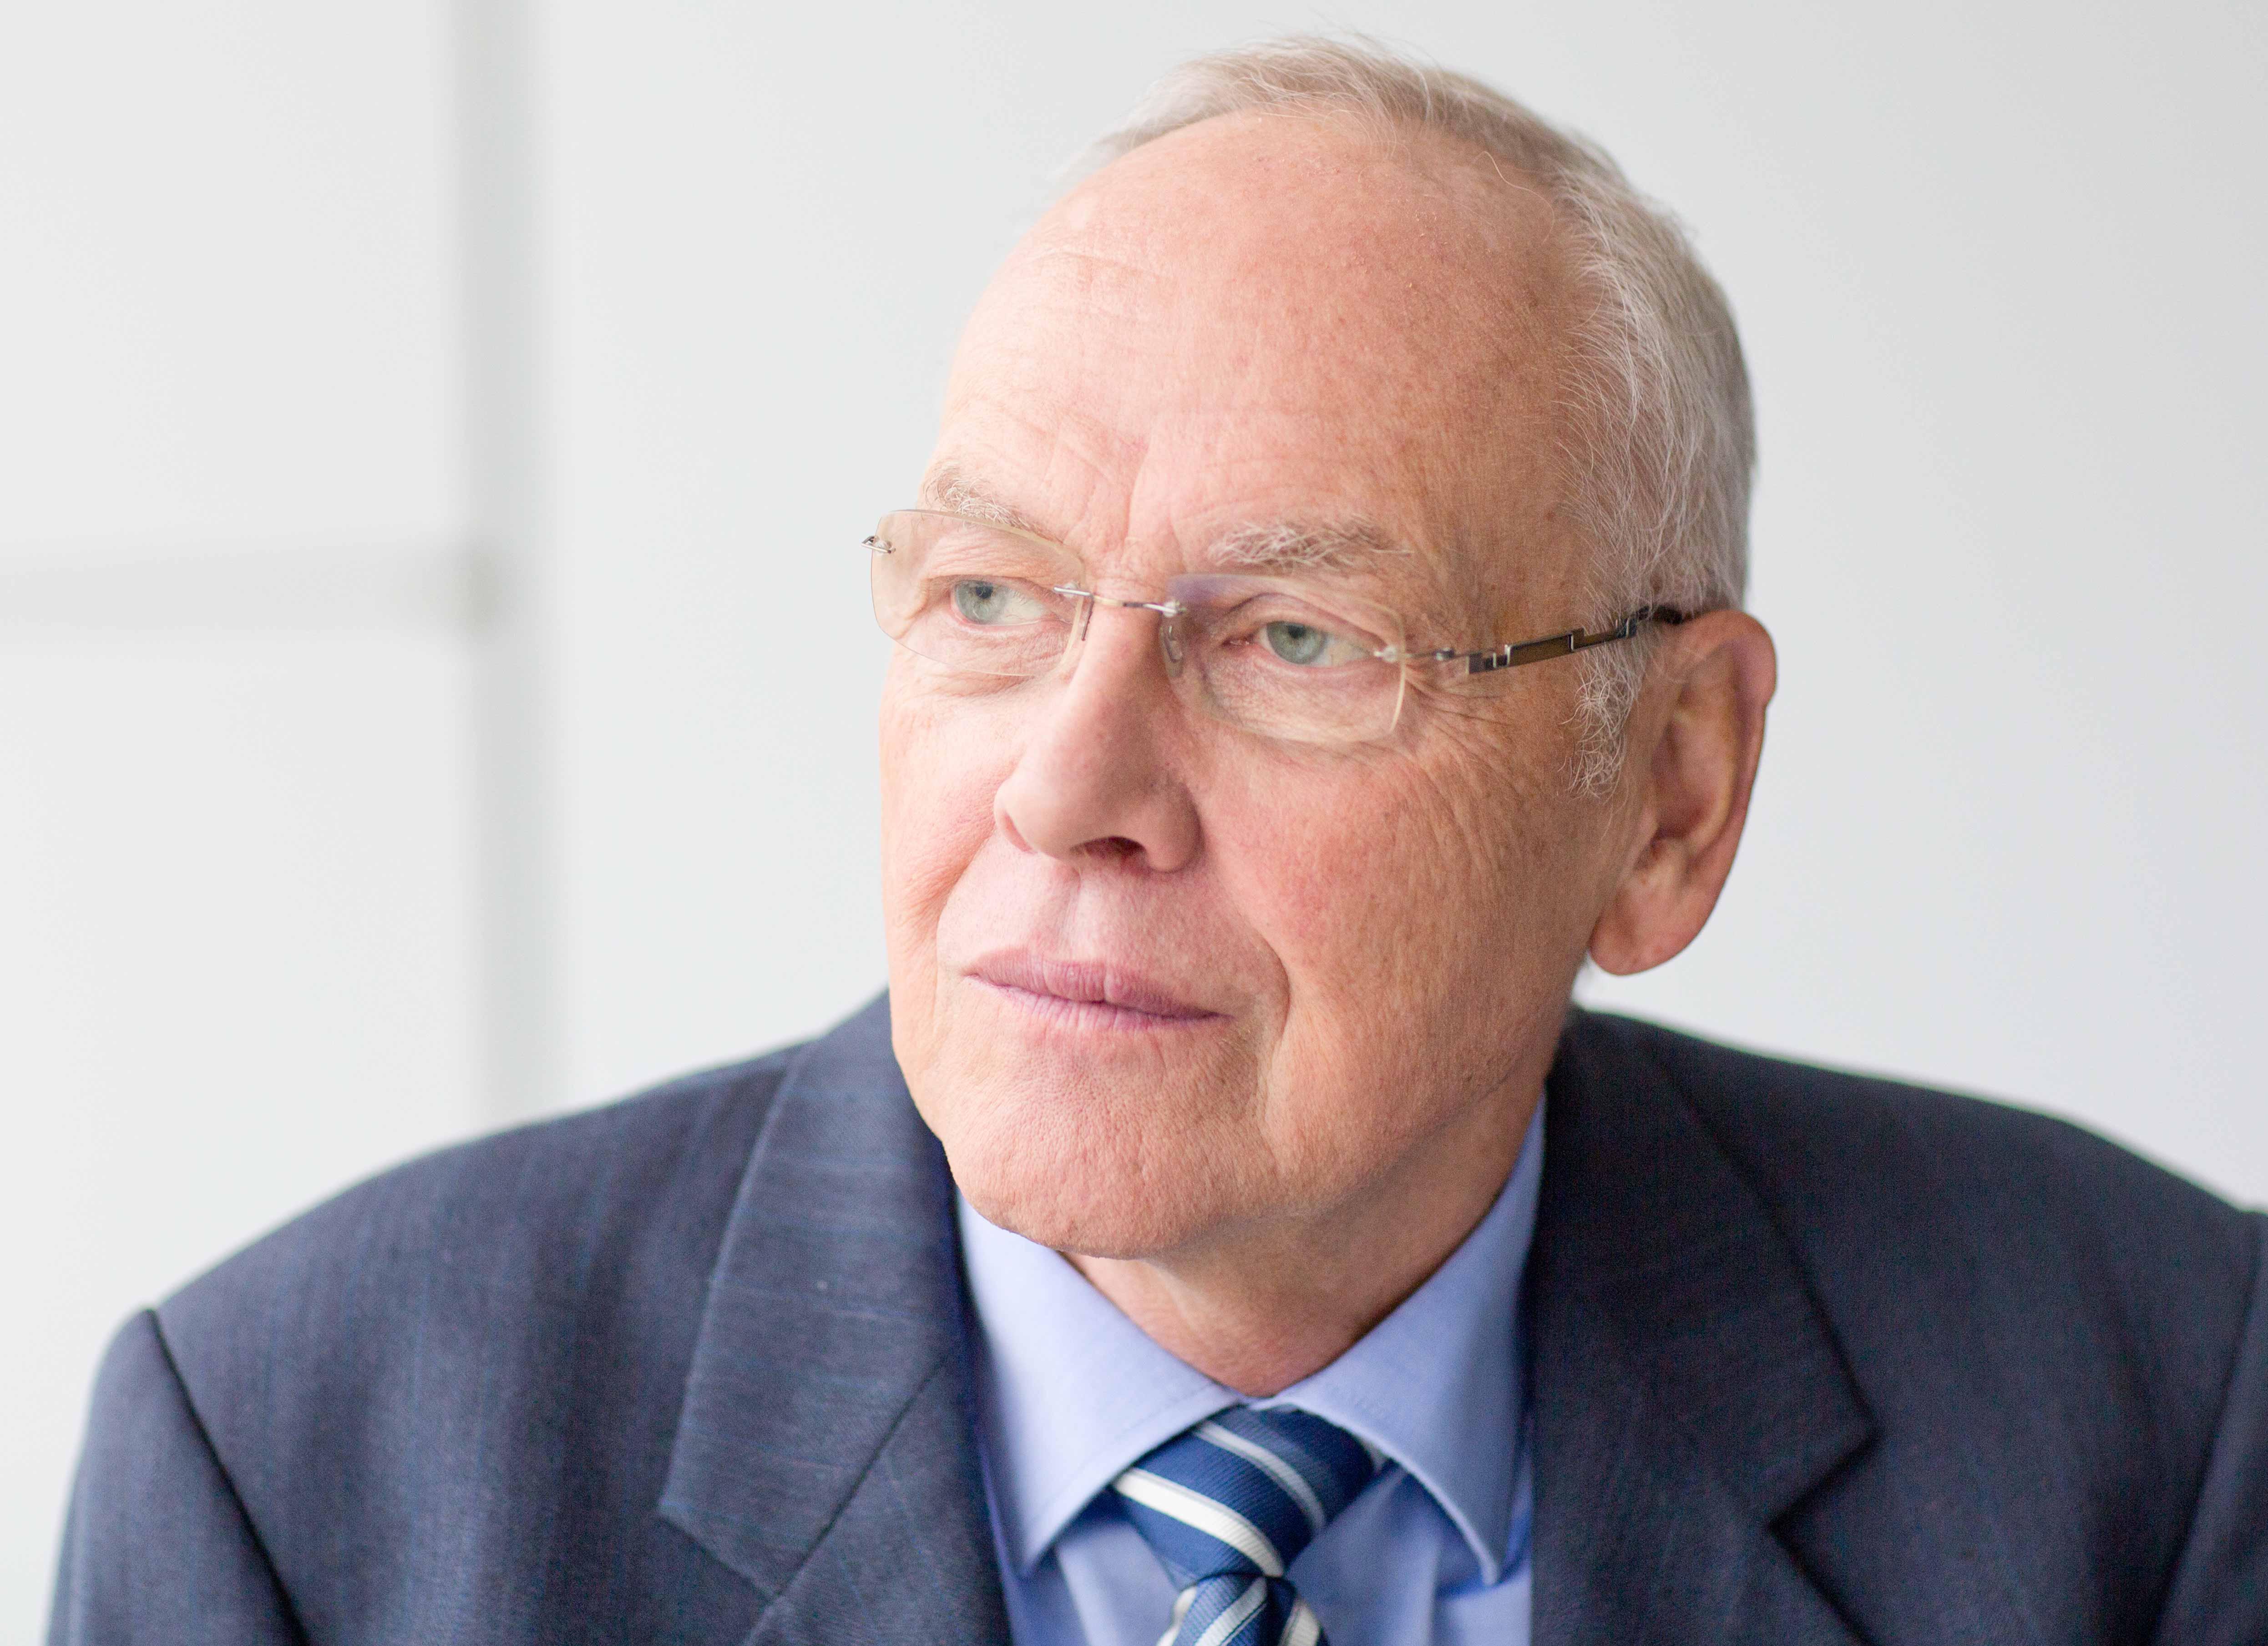 Dr. Ulrich Bossin